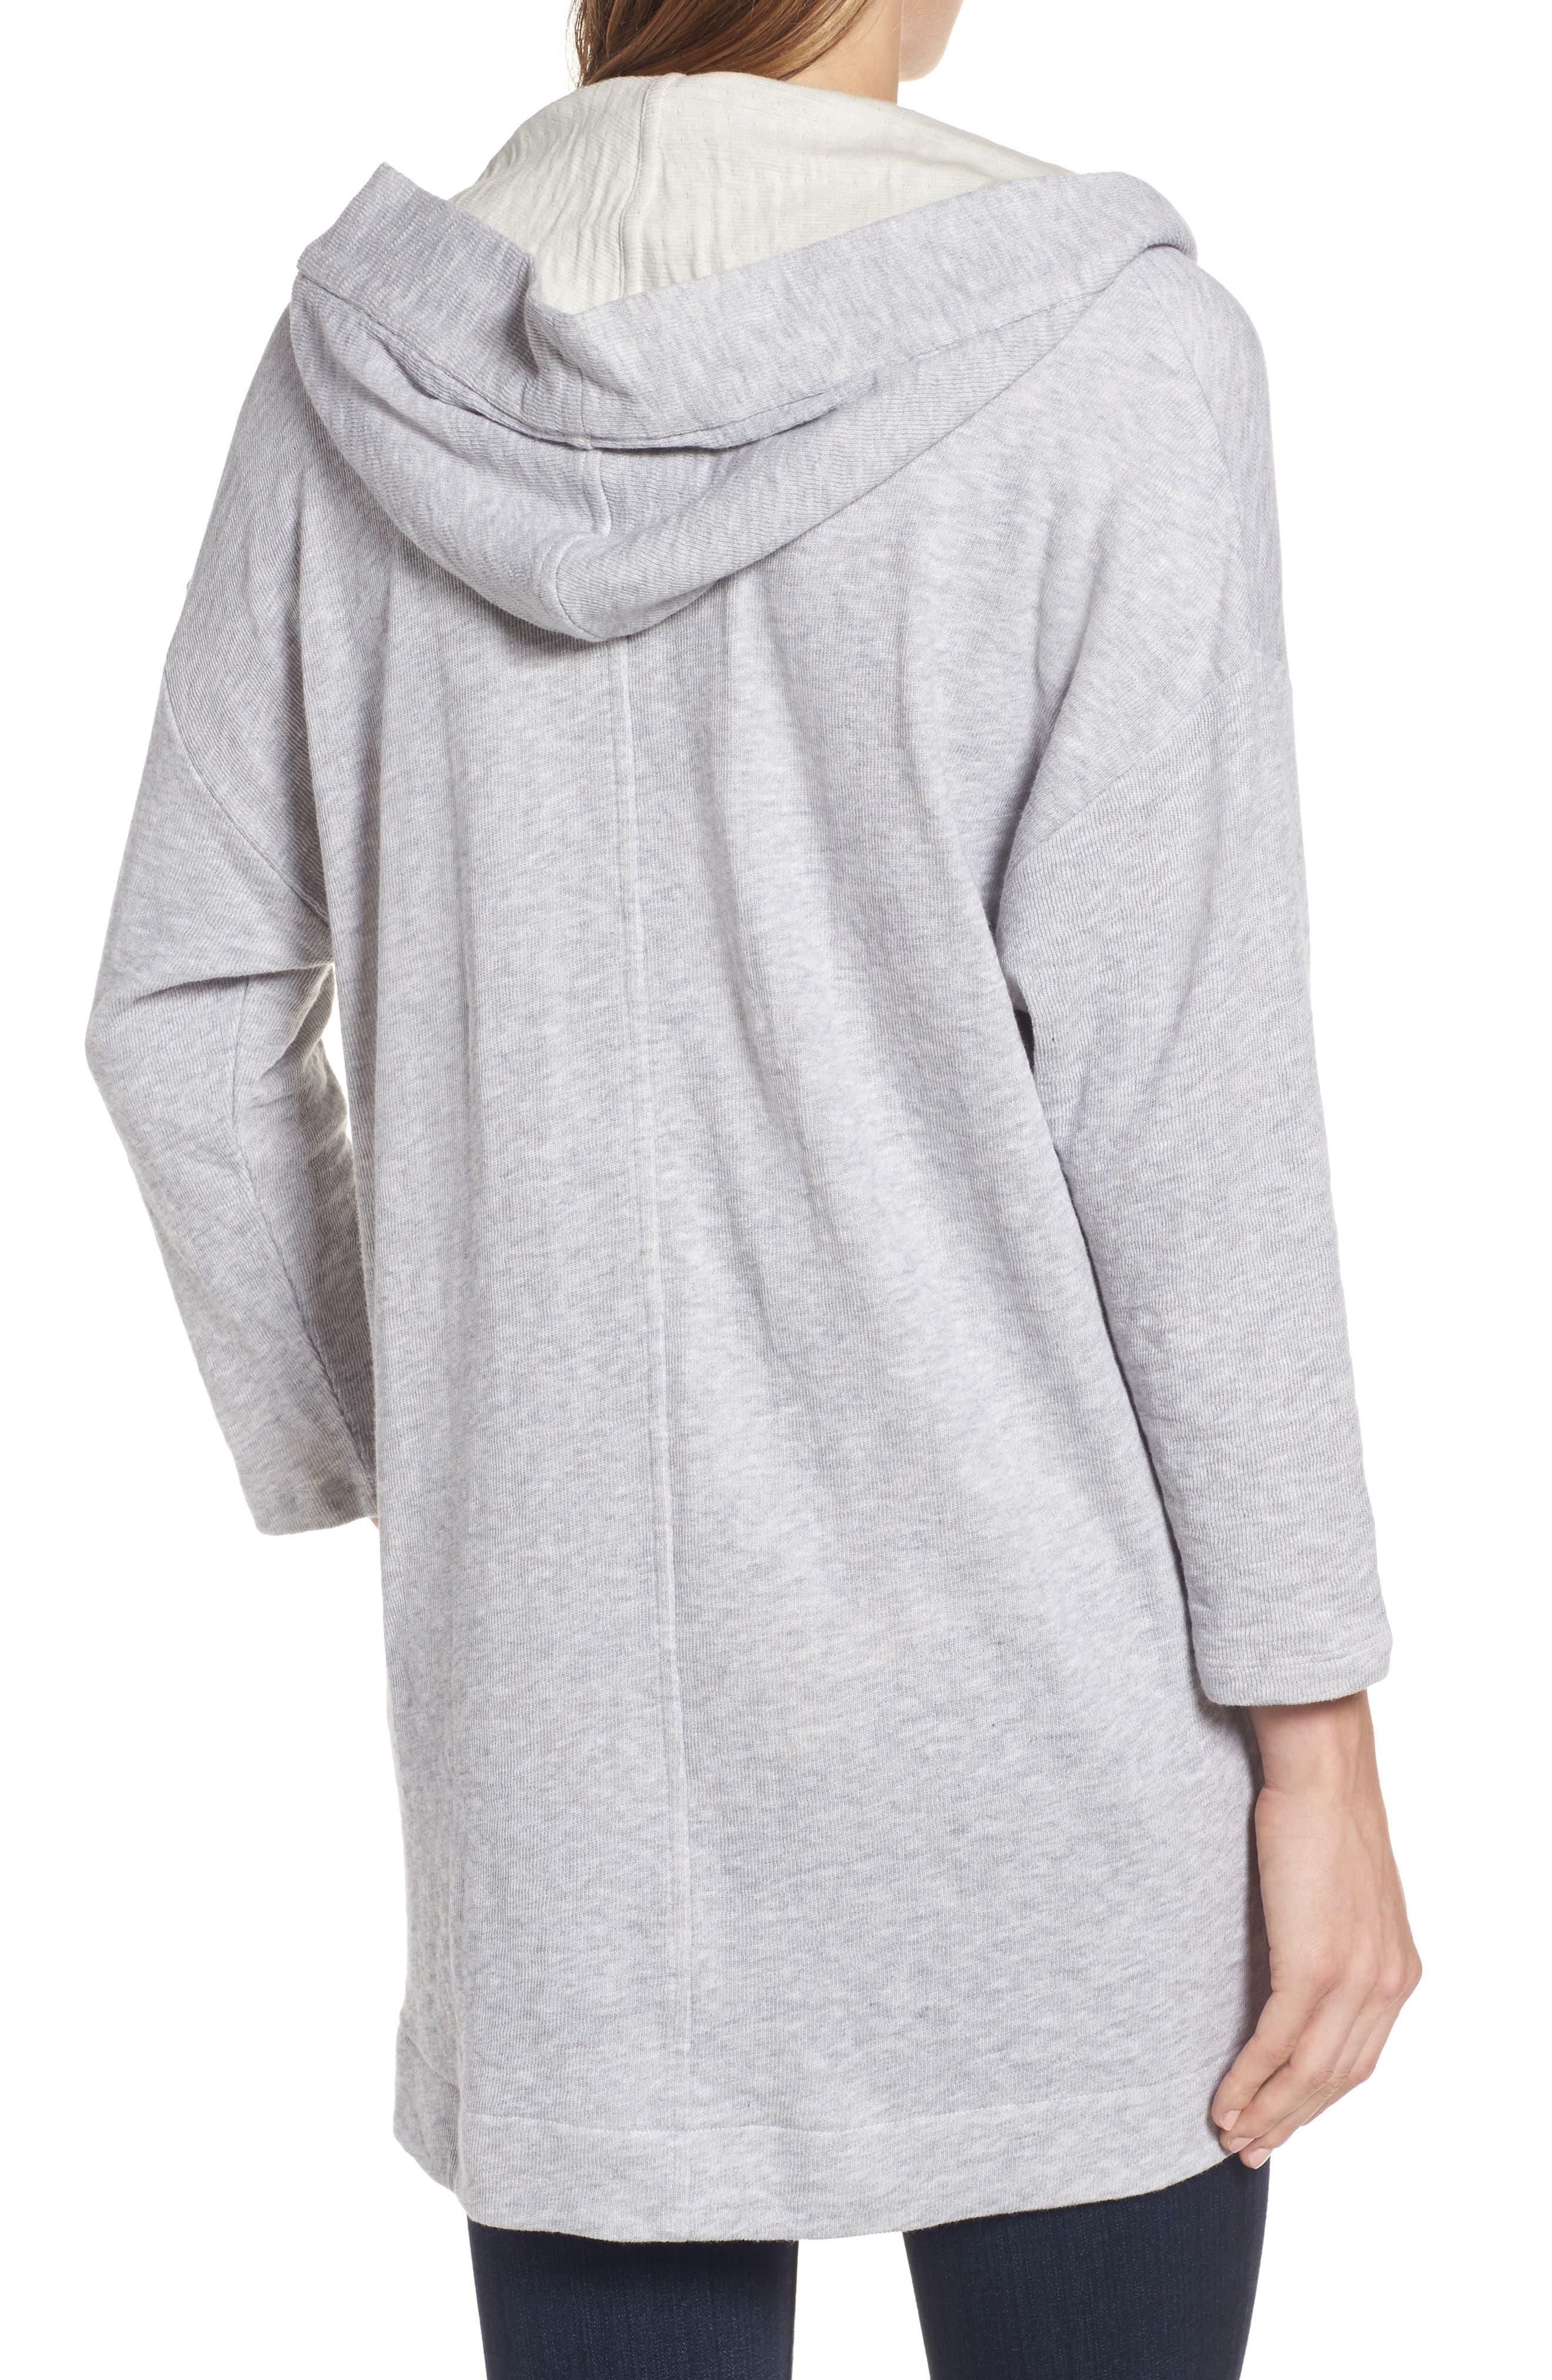 Organic Cotton Knit Hooded Jacket,                             Alternate thumbnail 2, color,